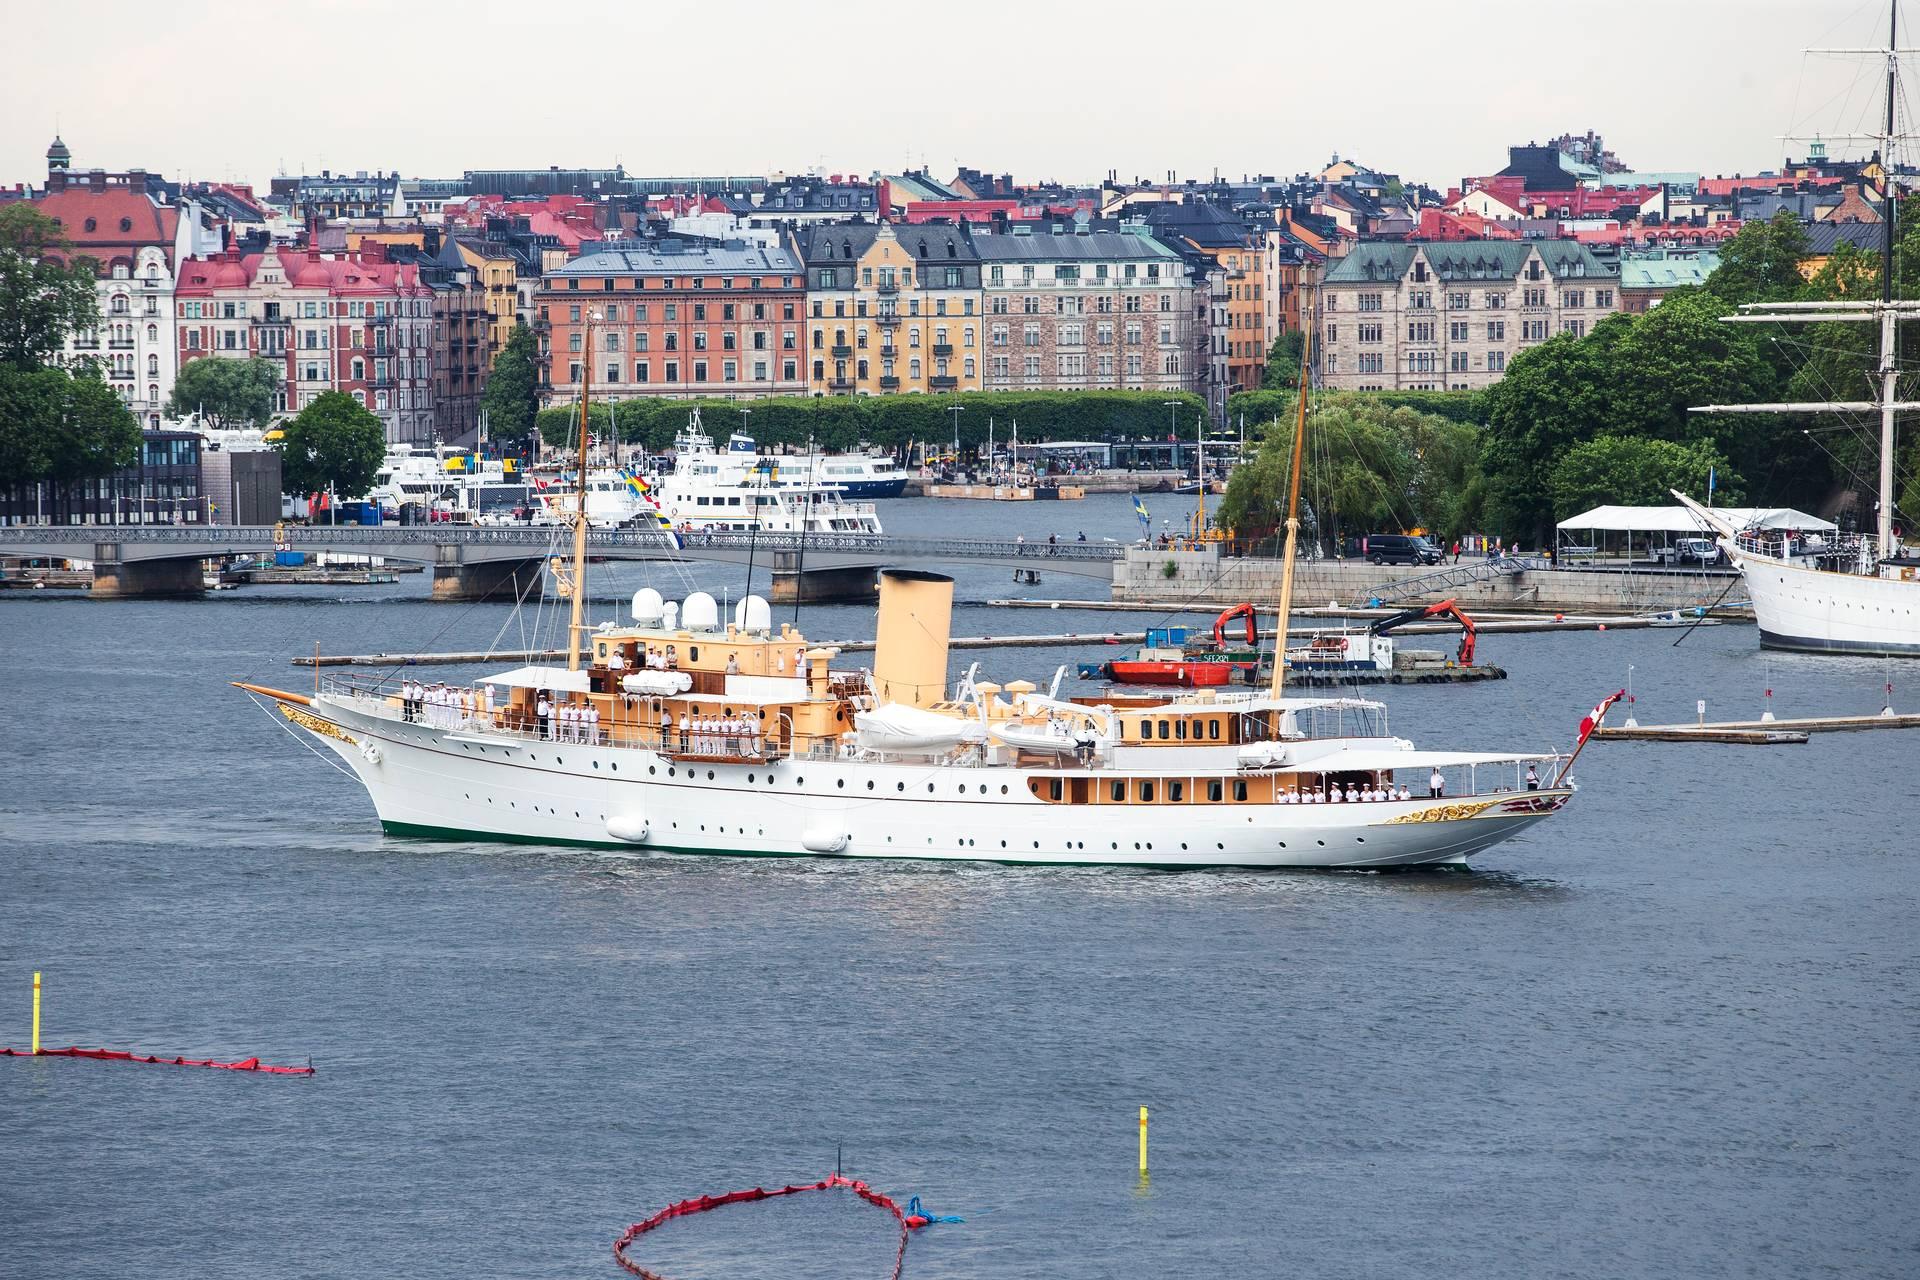 The Danish royal ship had engine problems